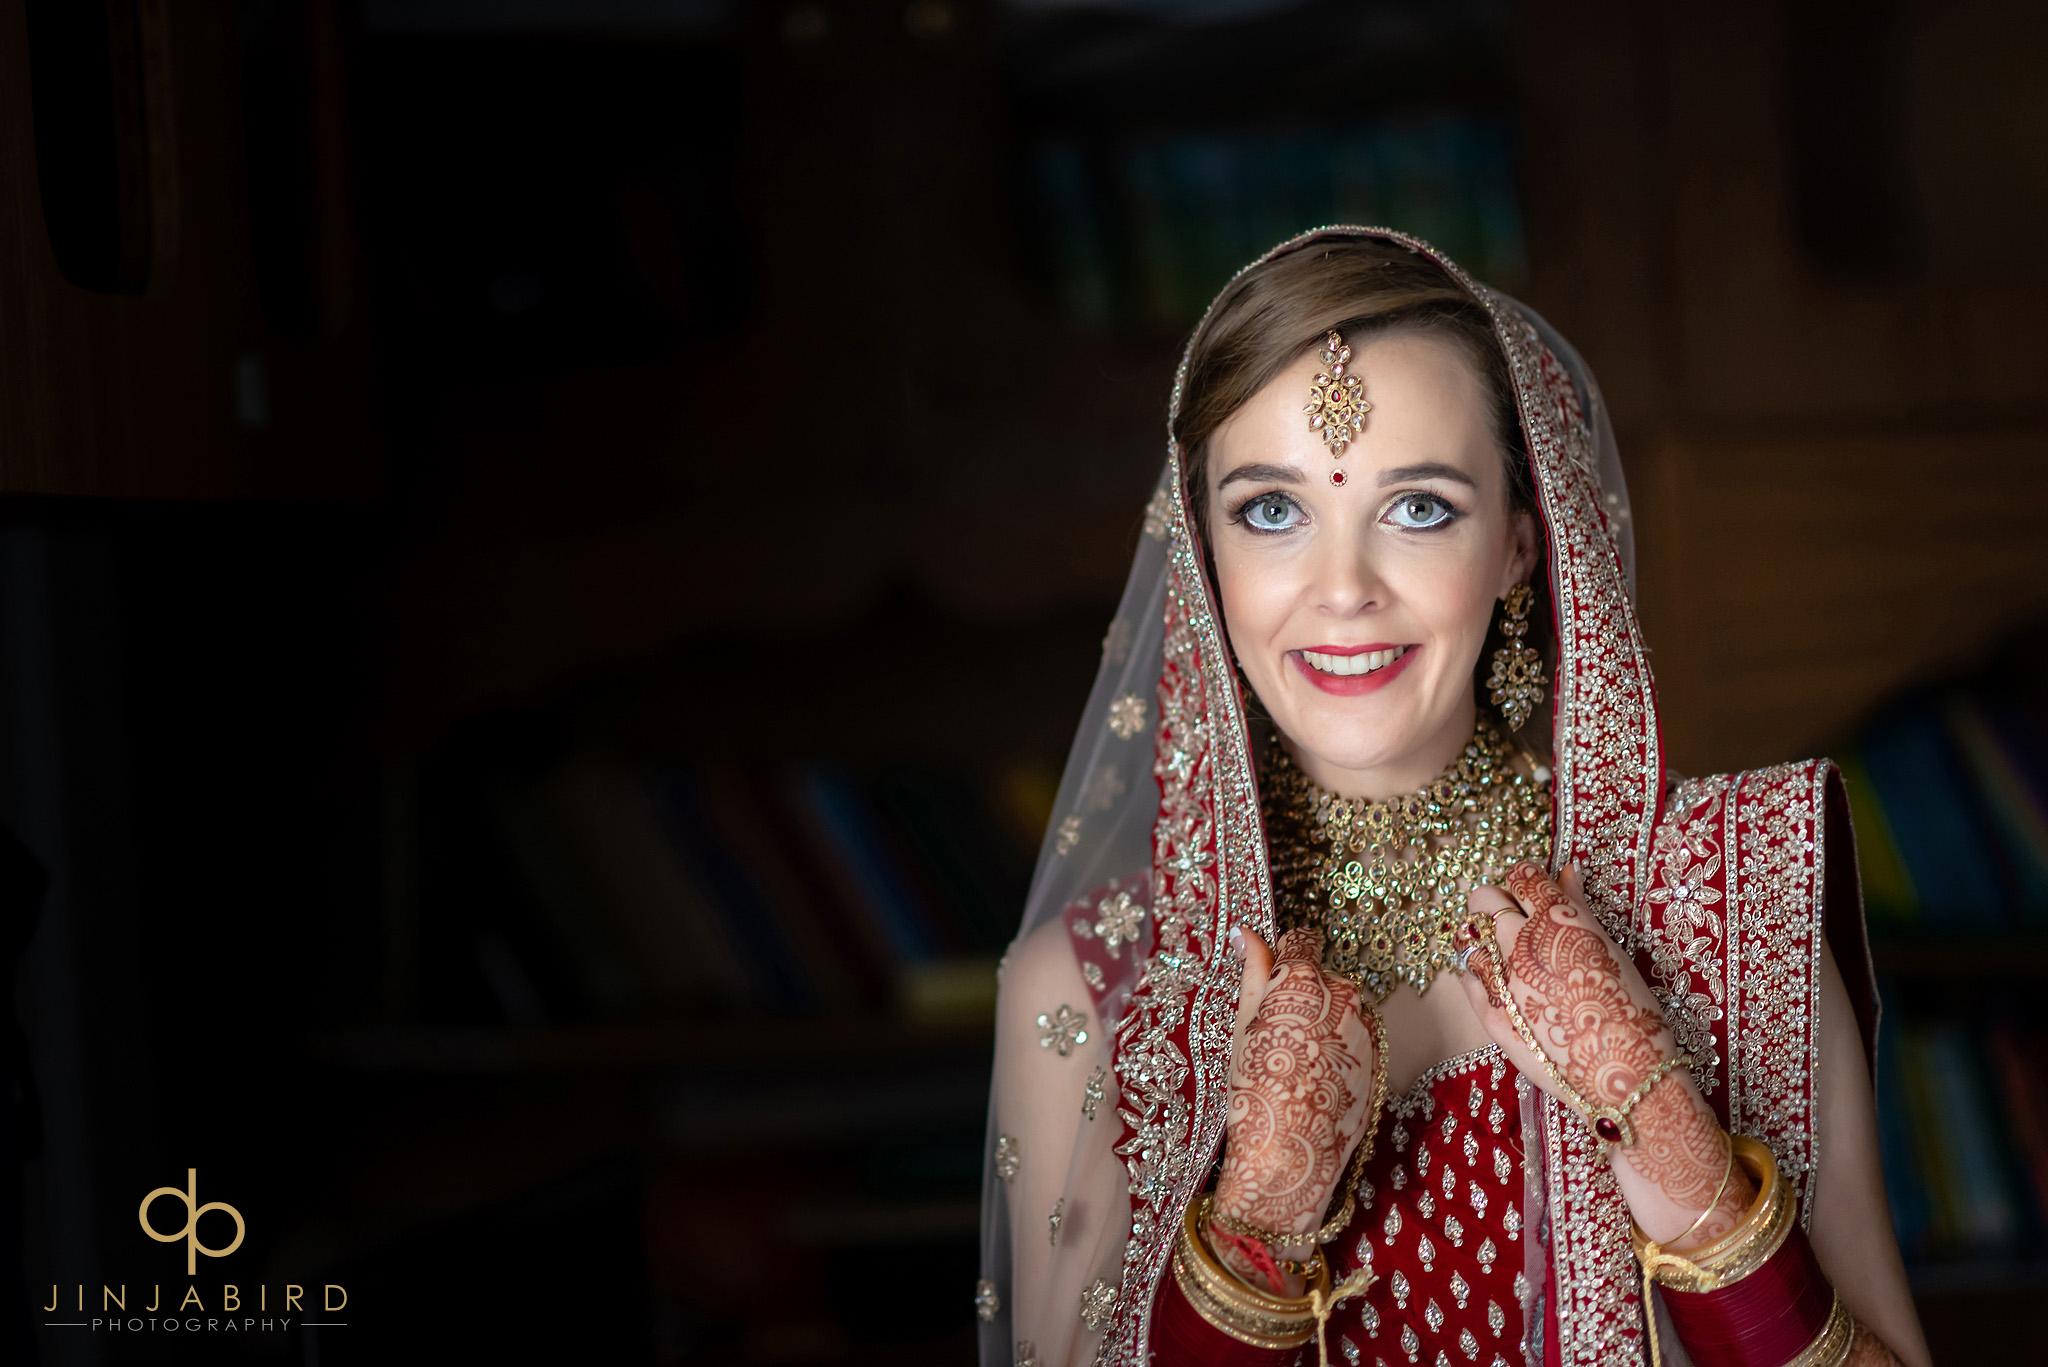 sikh photography